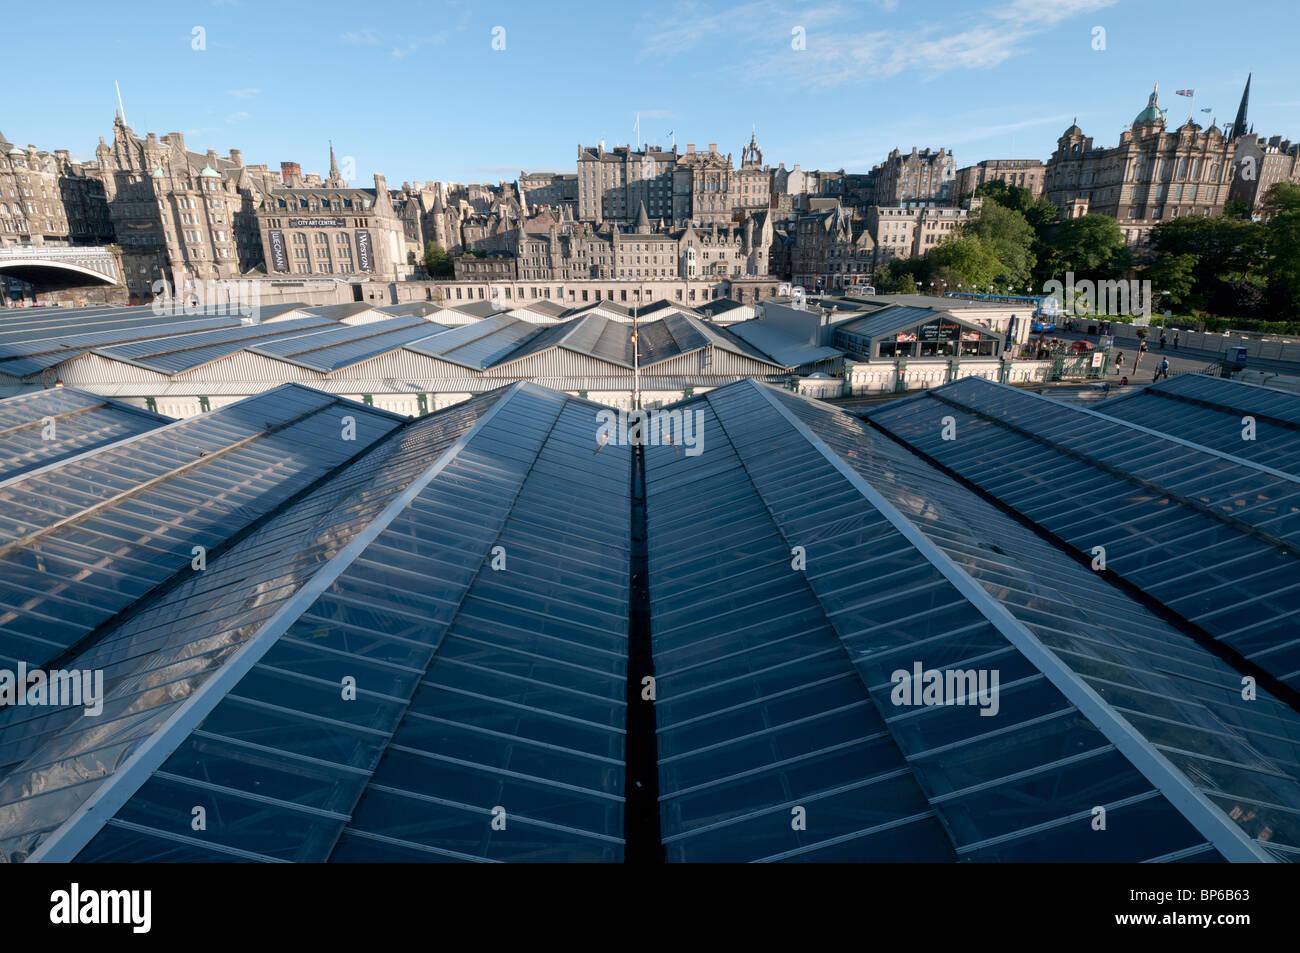 Edinburgh Glass Roof - Stock Image